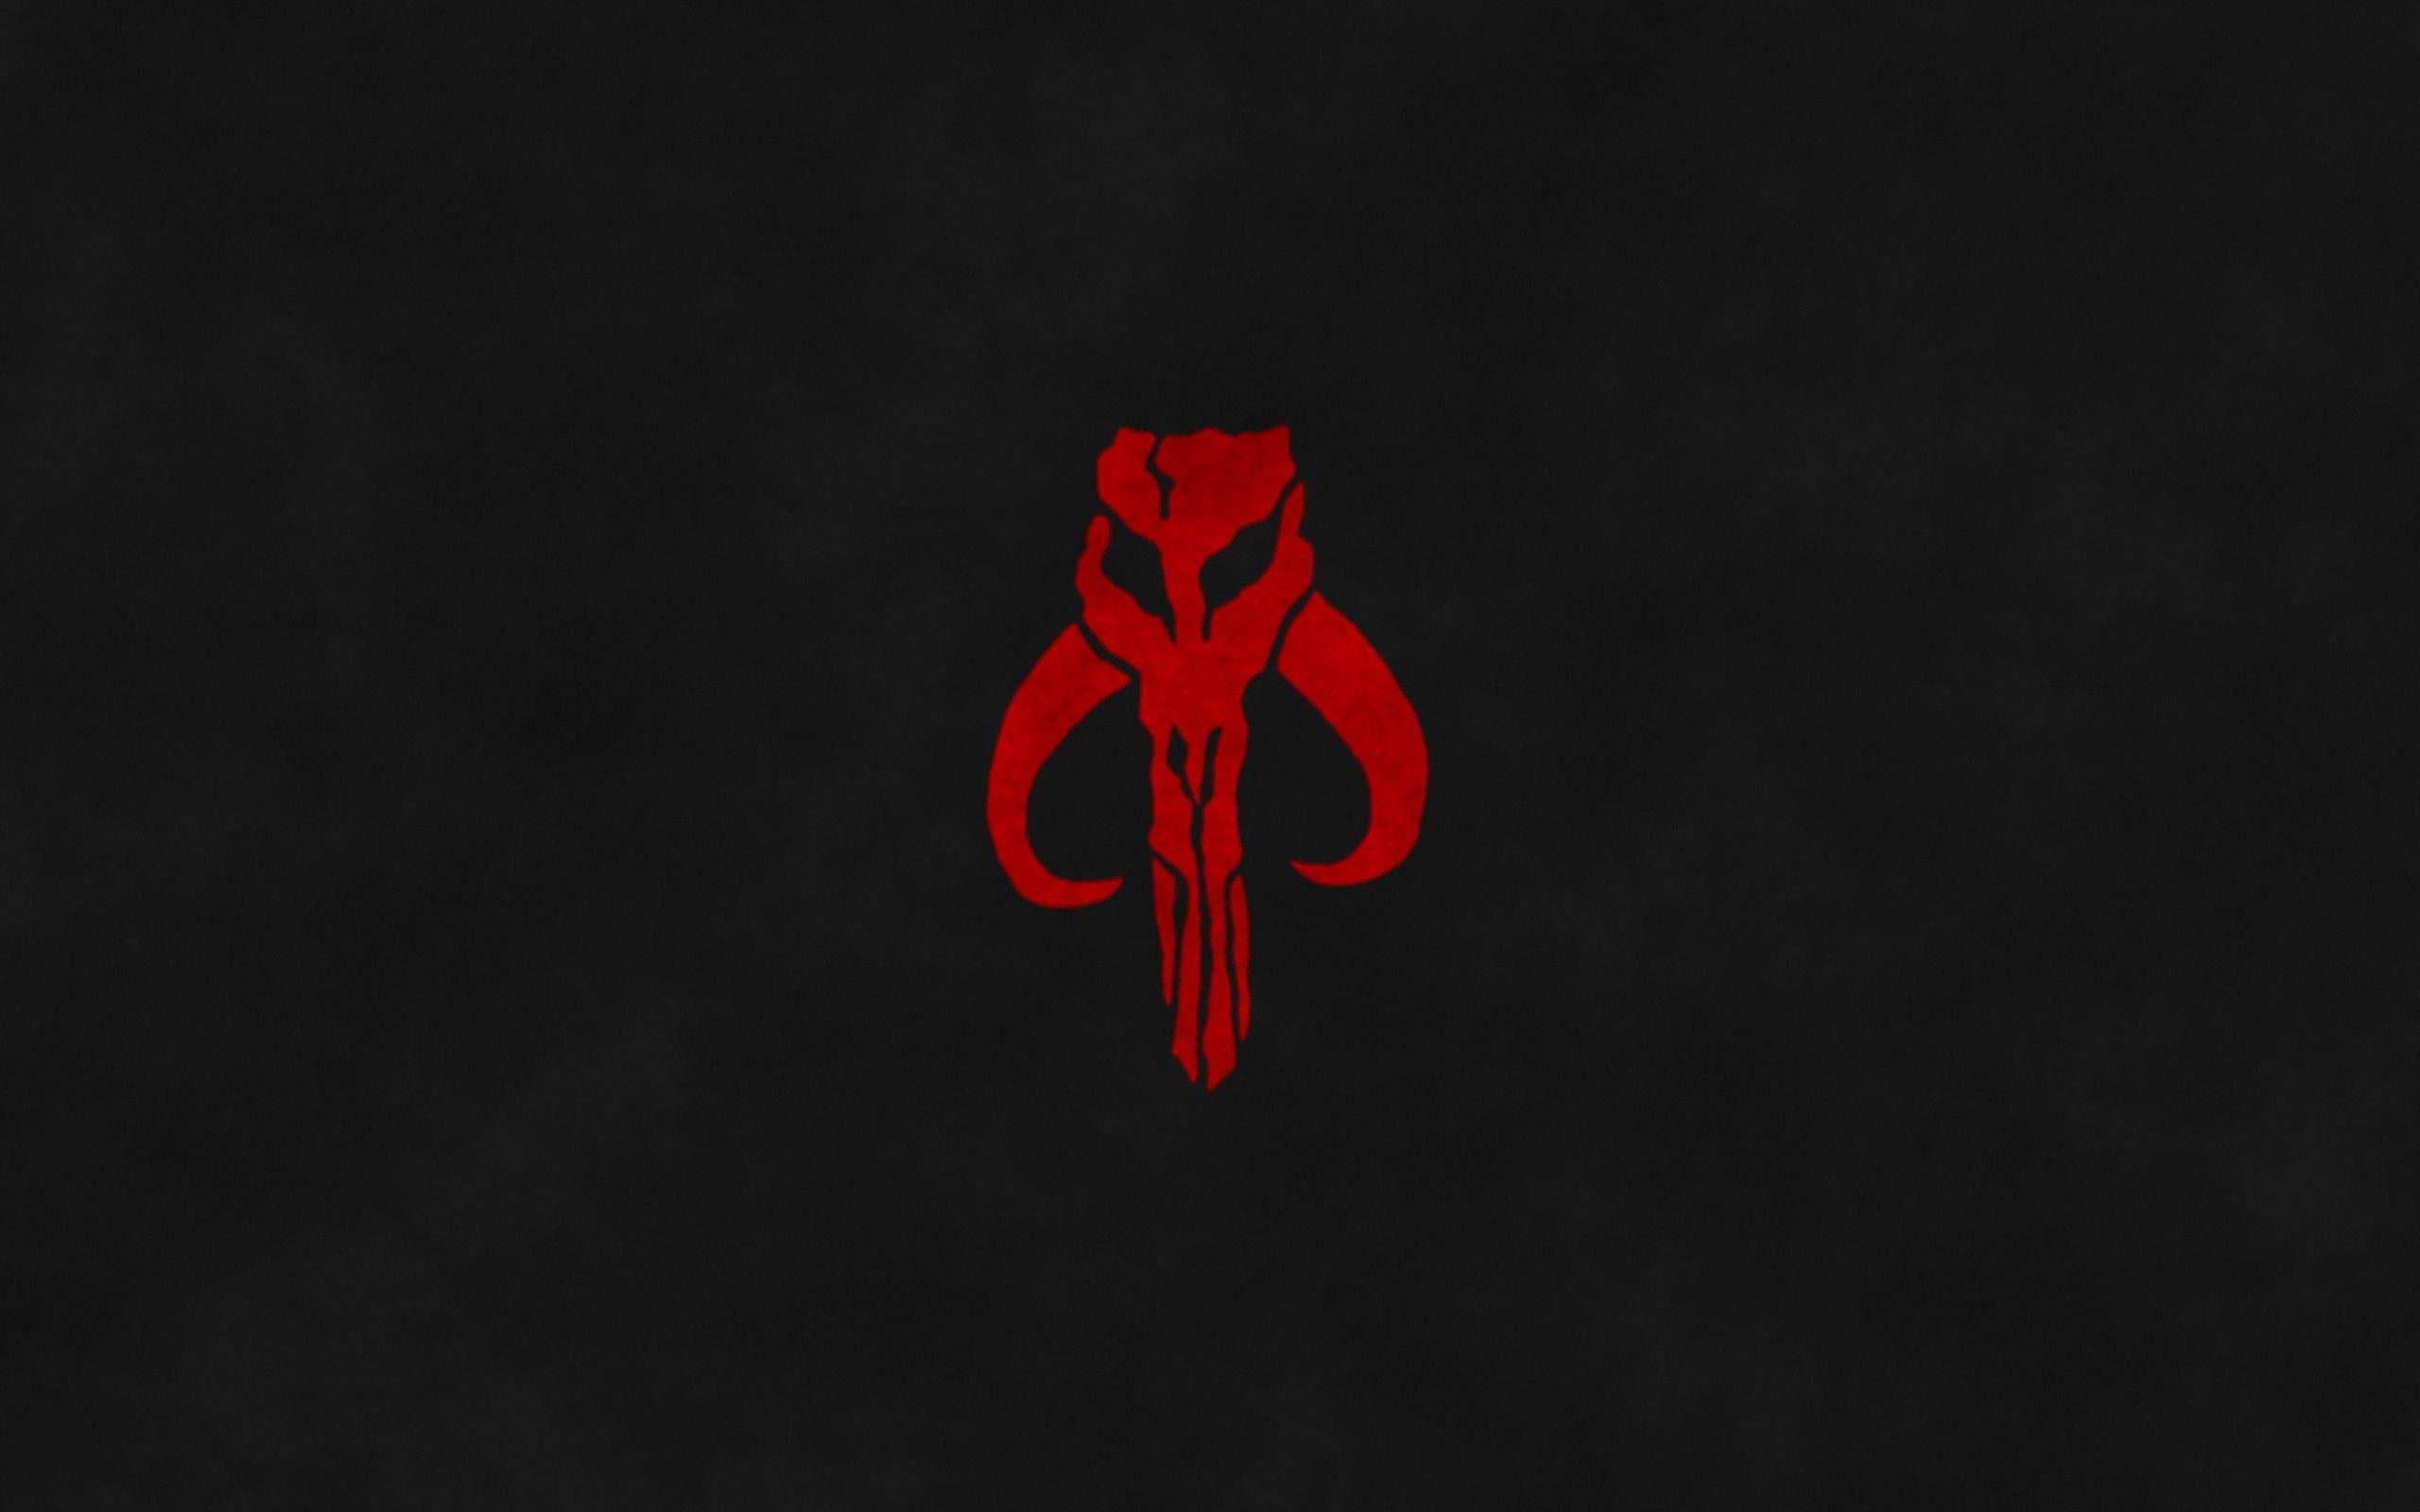 Mandalorian Star Wars Dark Emblems Wallpaper Red And Black Background Star Wars Star Wars Boba Fett